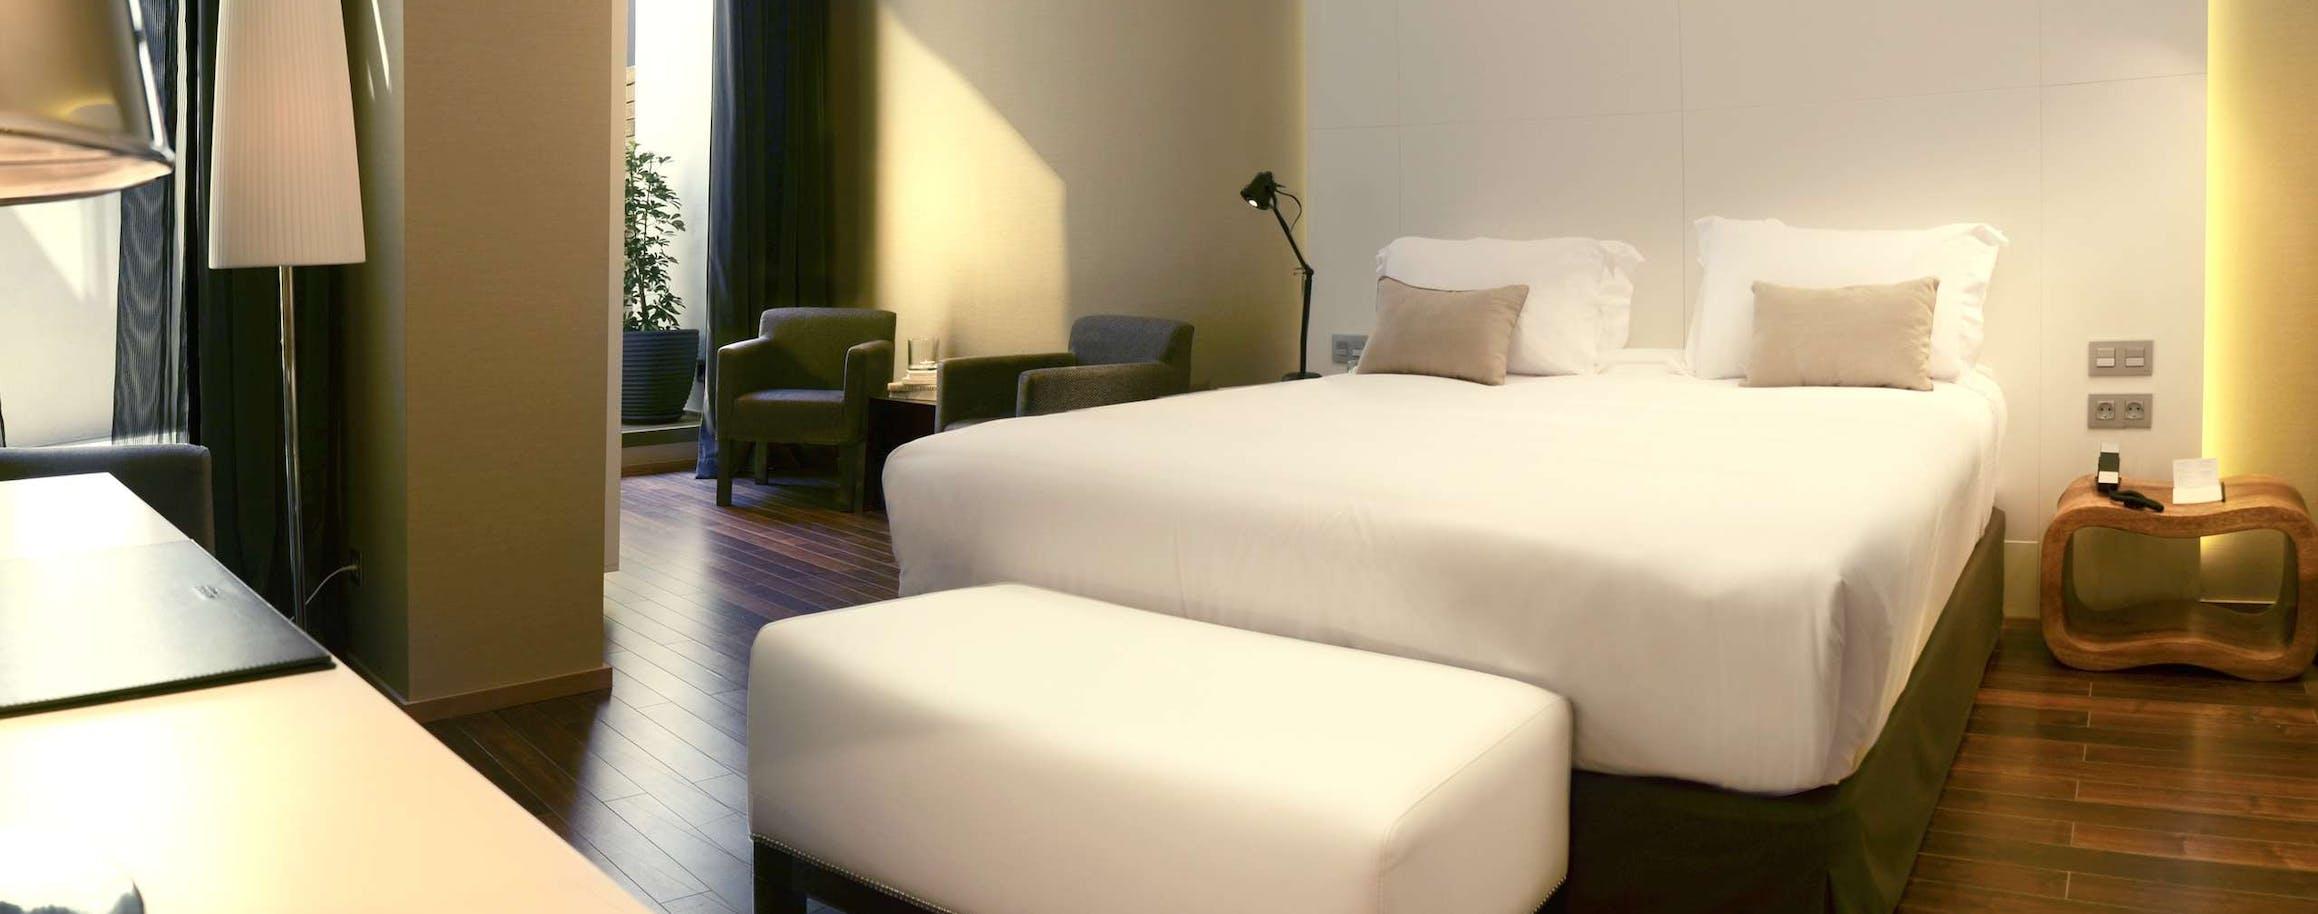 Advance Hotel Barcelona, Barcellona - HotelTonight